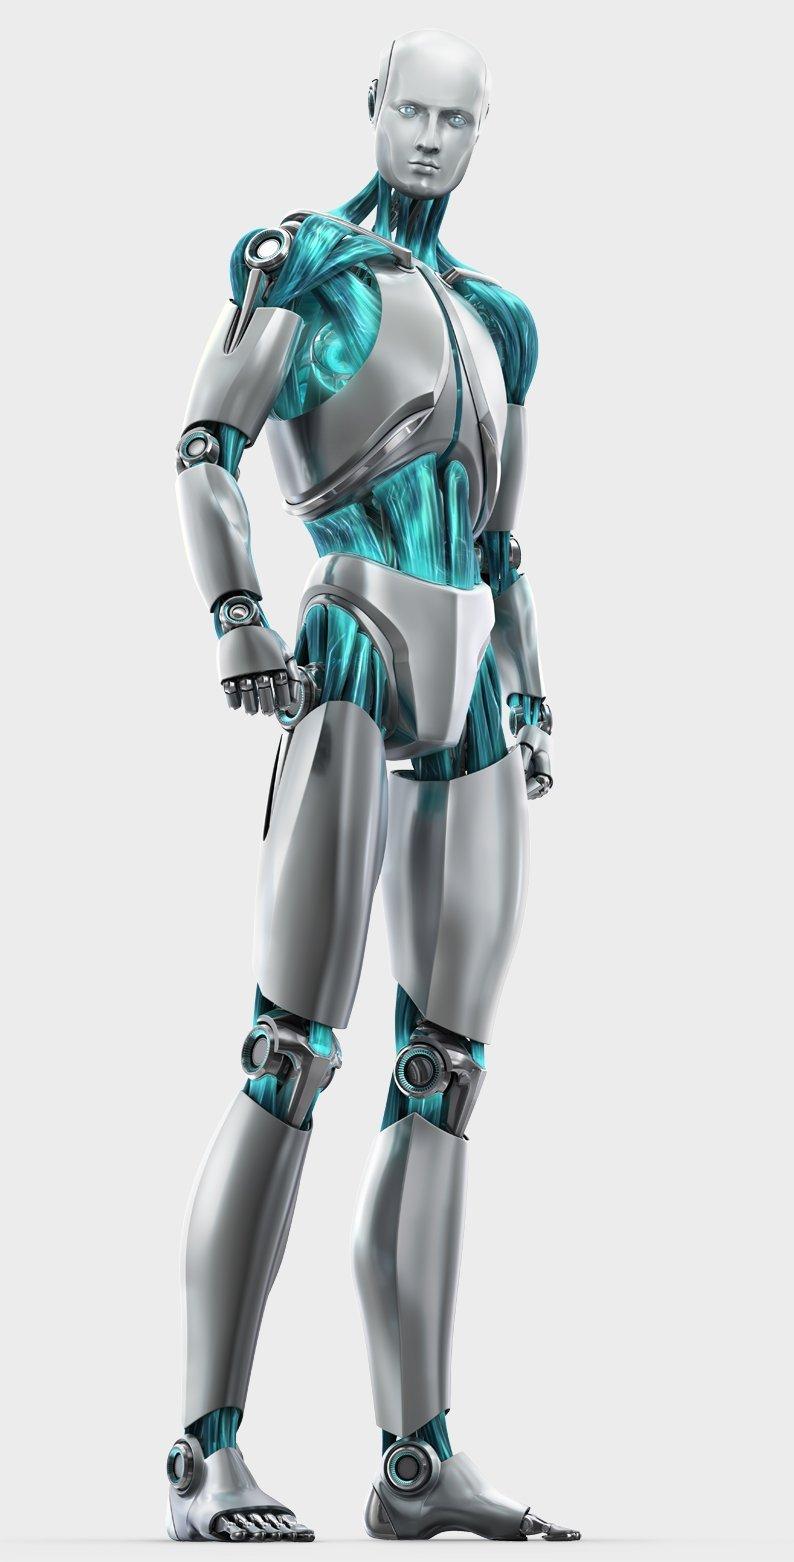 Eset-Robot.jpg